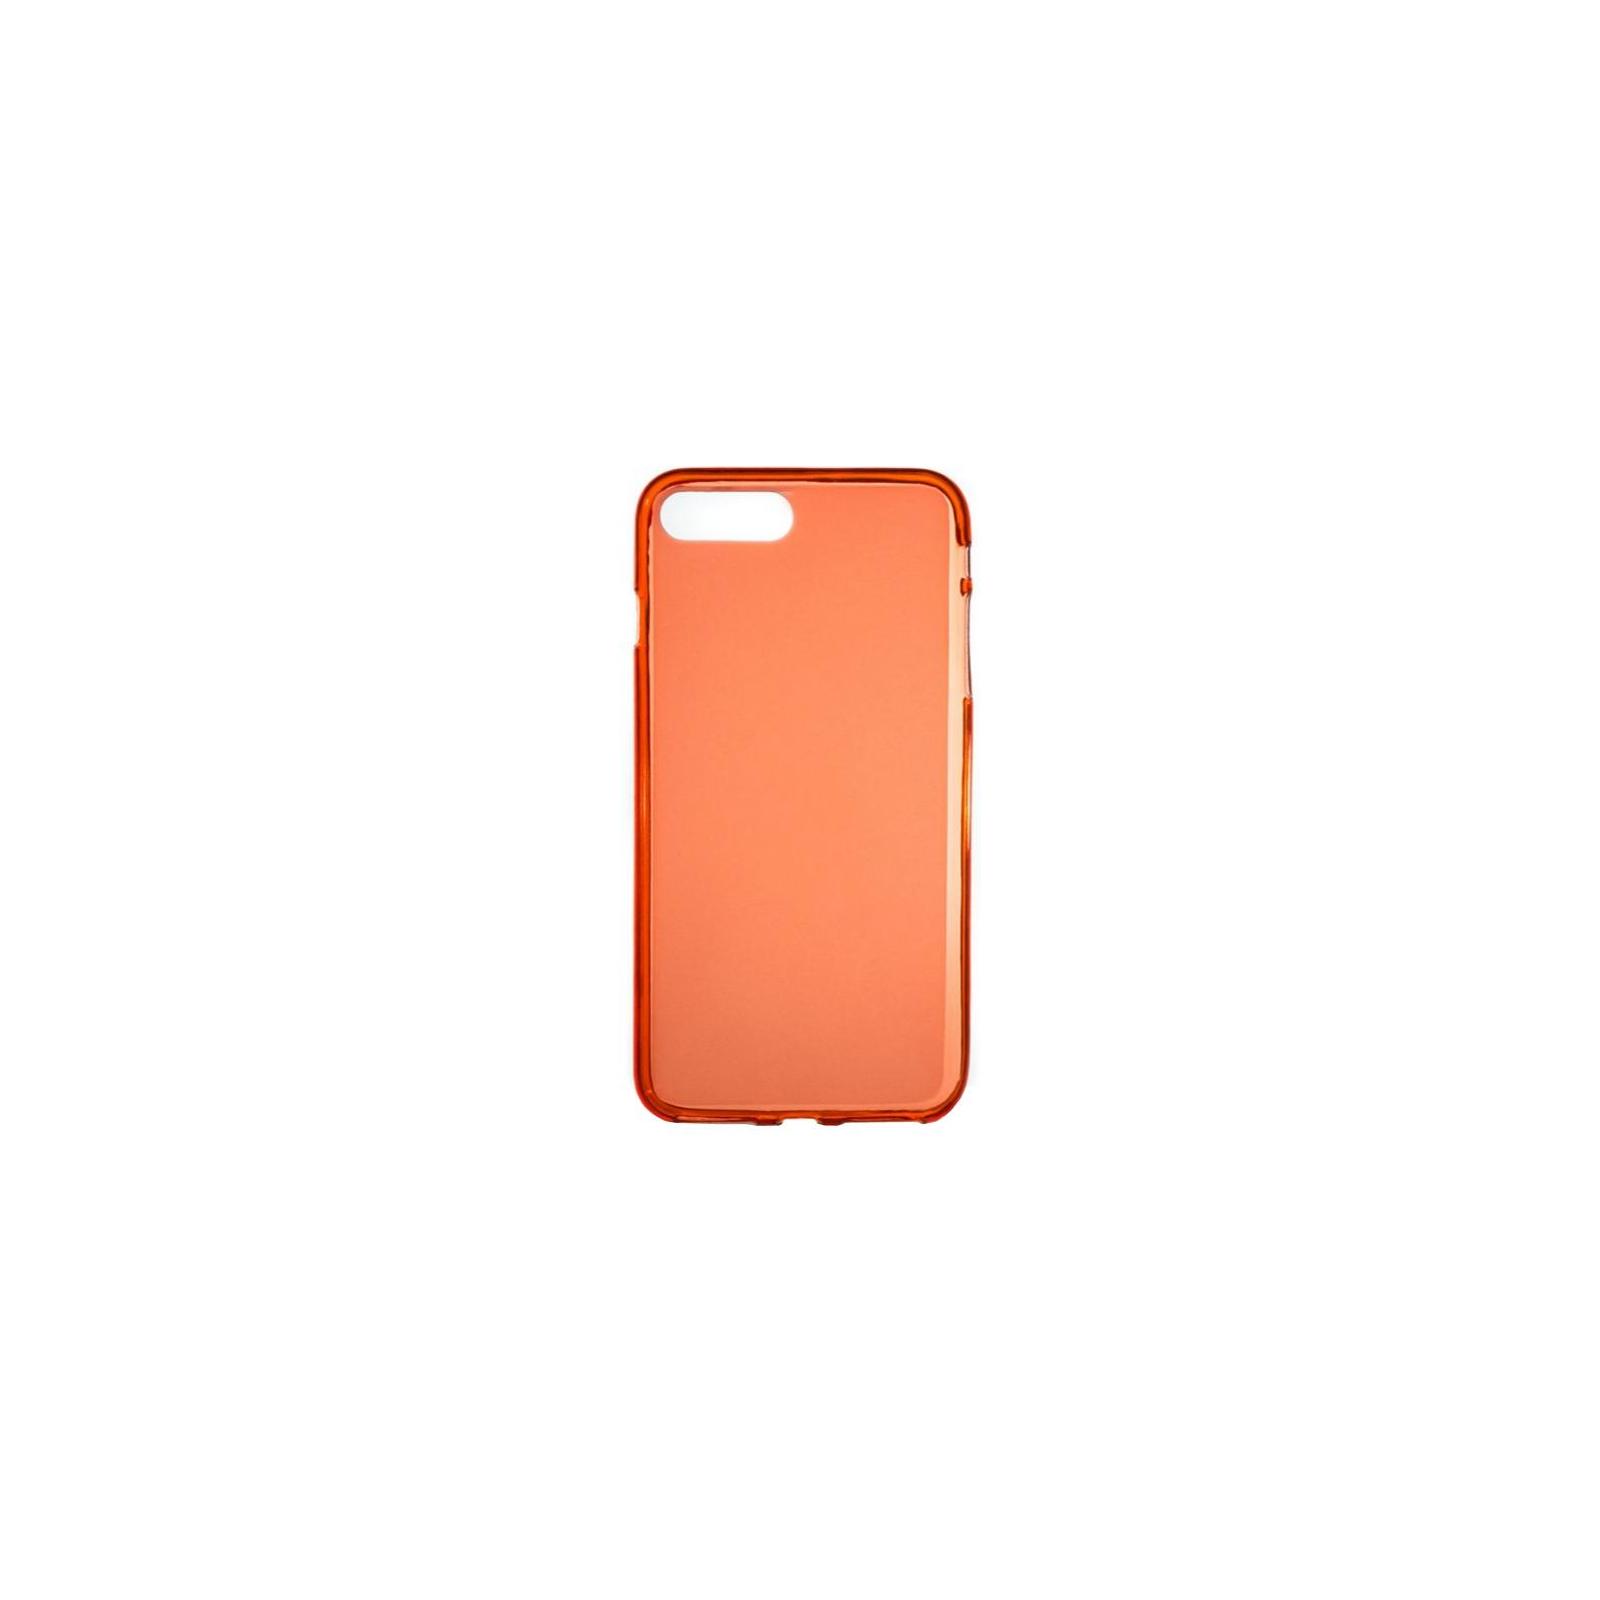 Чехол для моб. телефона Colorway TPU case for Apple iPhone 7/8 plus, red (CW-CTPAI7P-RD)